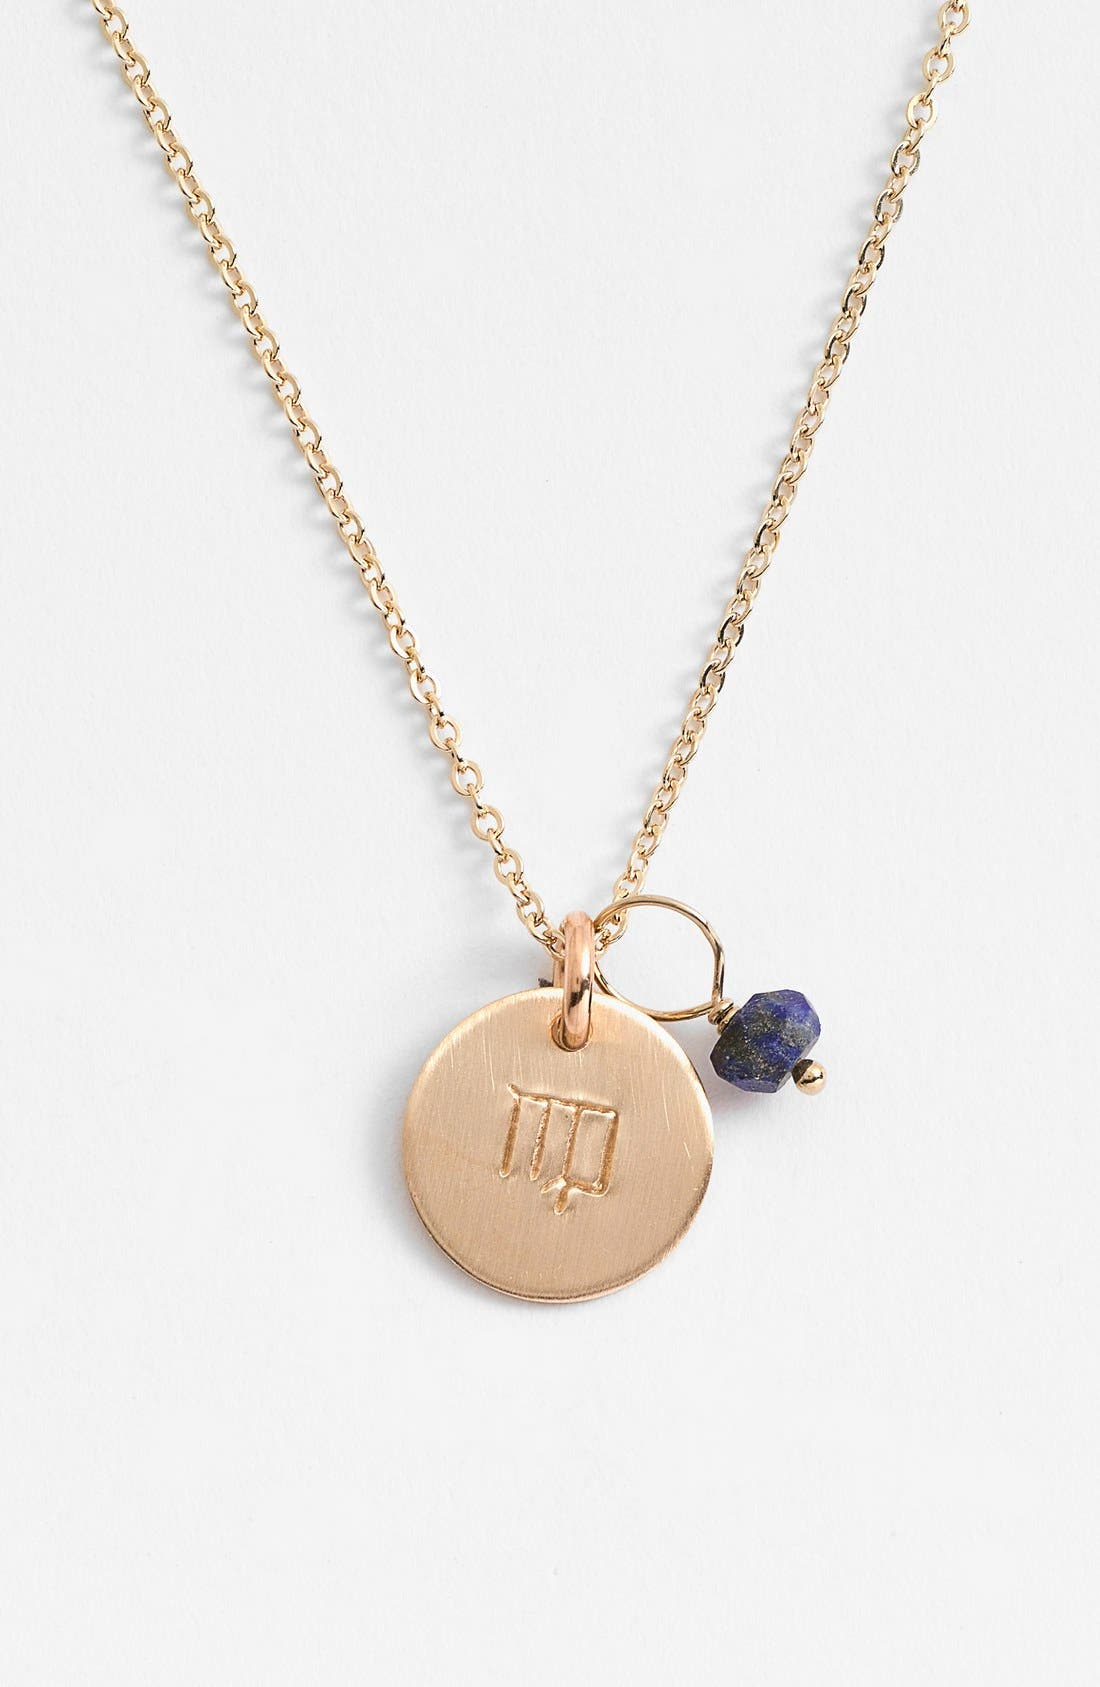 Alternate Image 1 Selected - Nashelle 14k-Gold Fill & Semiprecious Birthstone Zodiac Mini Disc Necklace